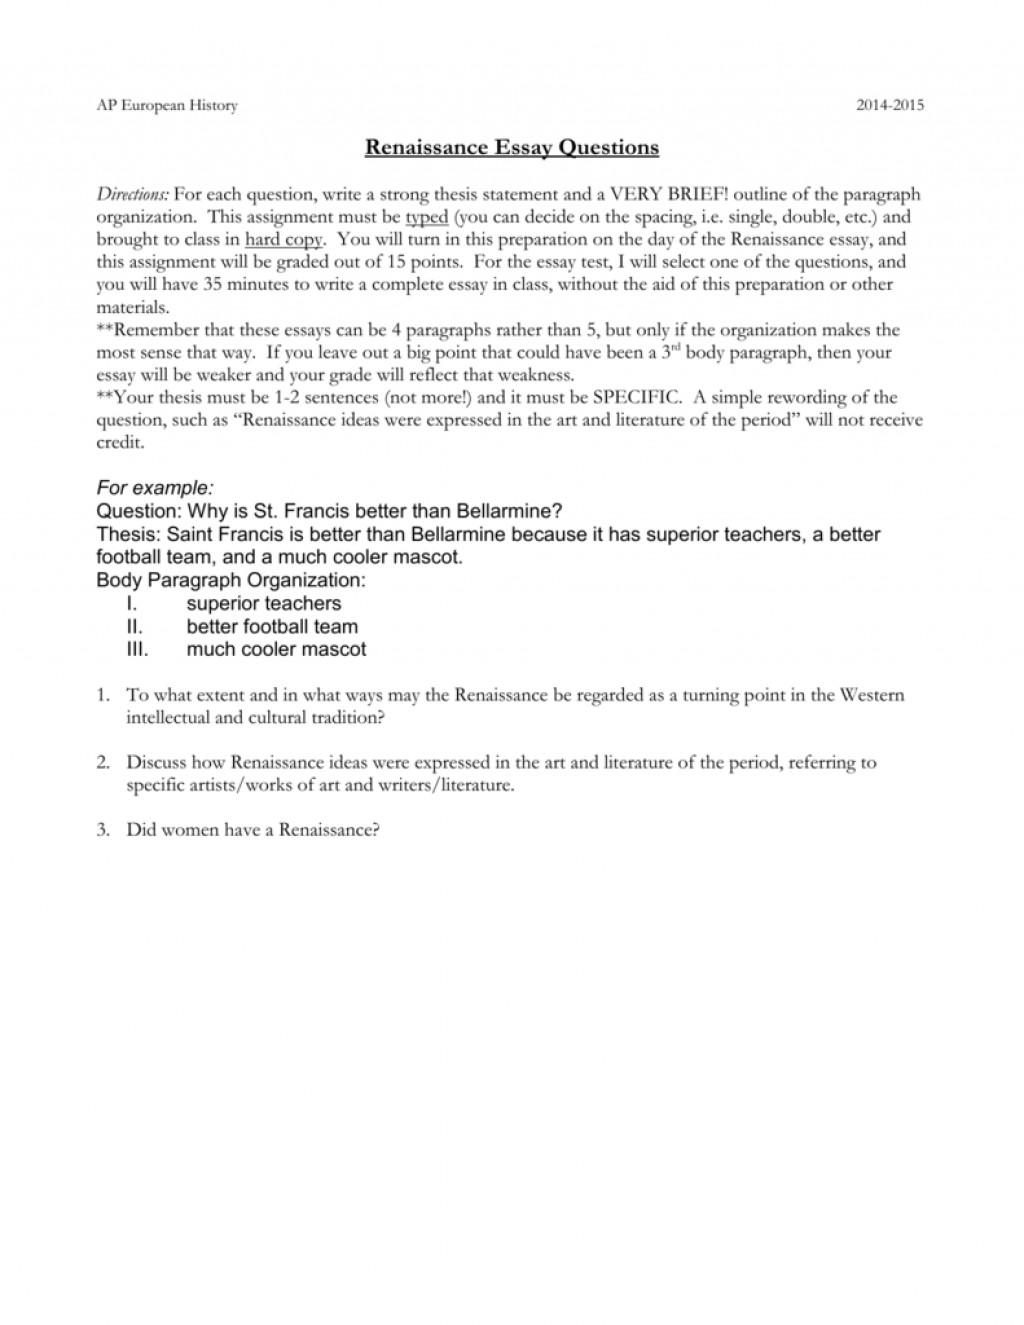 006 Renaissance Essay 008916690 1 Surprising Harlem Introduction Sample Pdf Large